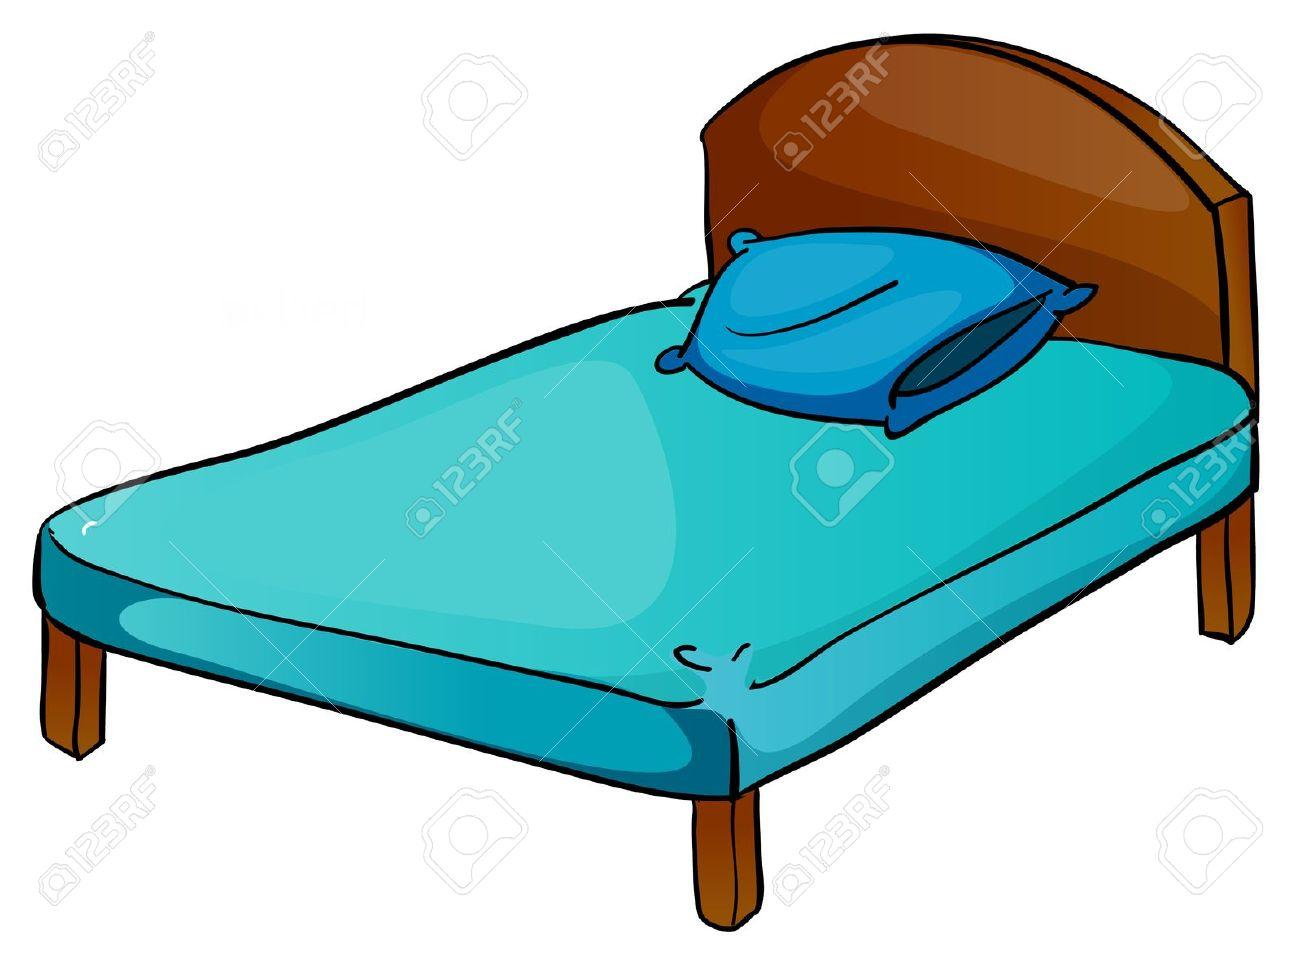 hight resolution of 1300x955 amusing bed clipart 23 depositphotos 186682090 stock illustration